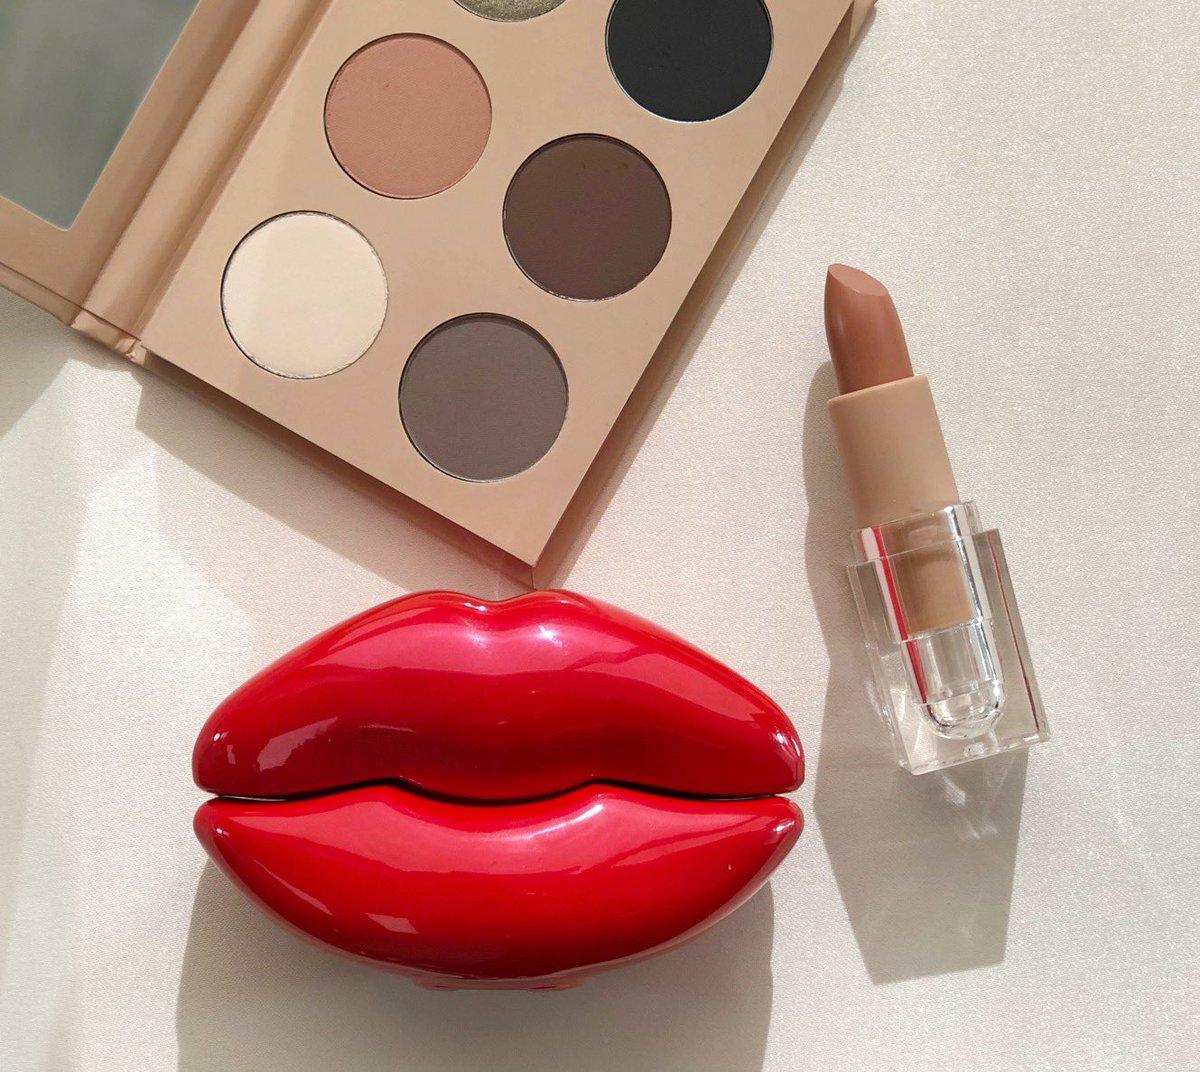 .@KylieJenner  by #KKWFRAGRANCE  Red Lips & #KKWBEAUTY  ✨